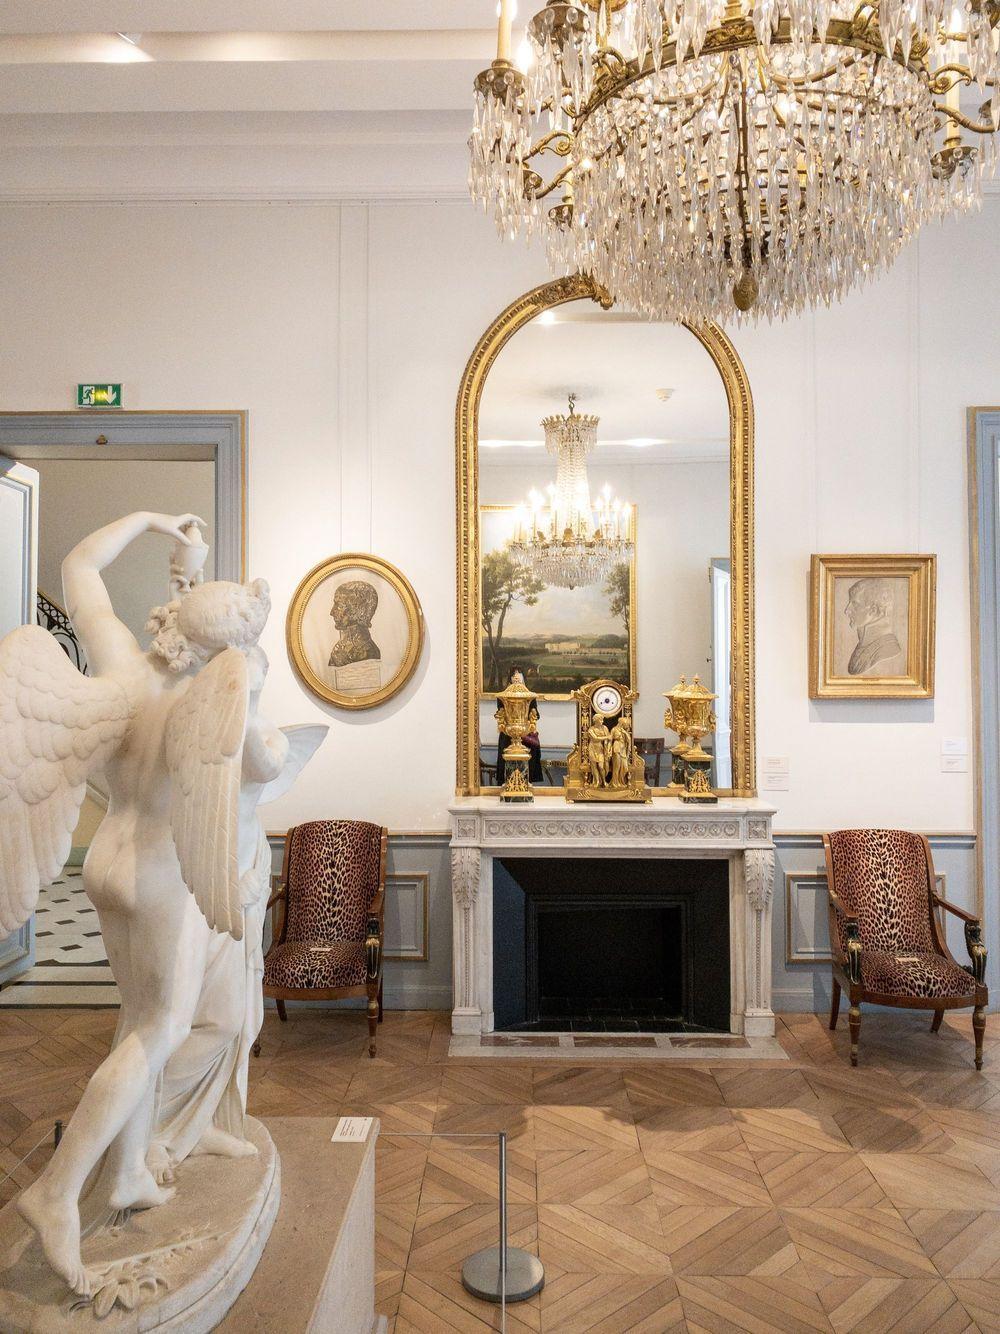 Musee Marmottan Monet, Paris